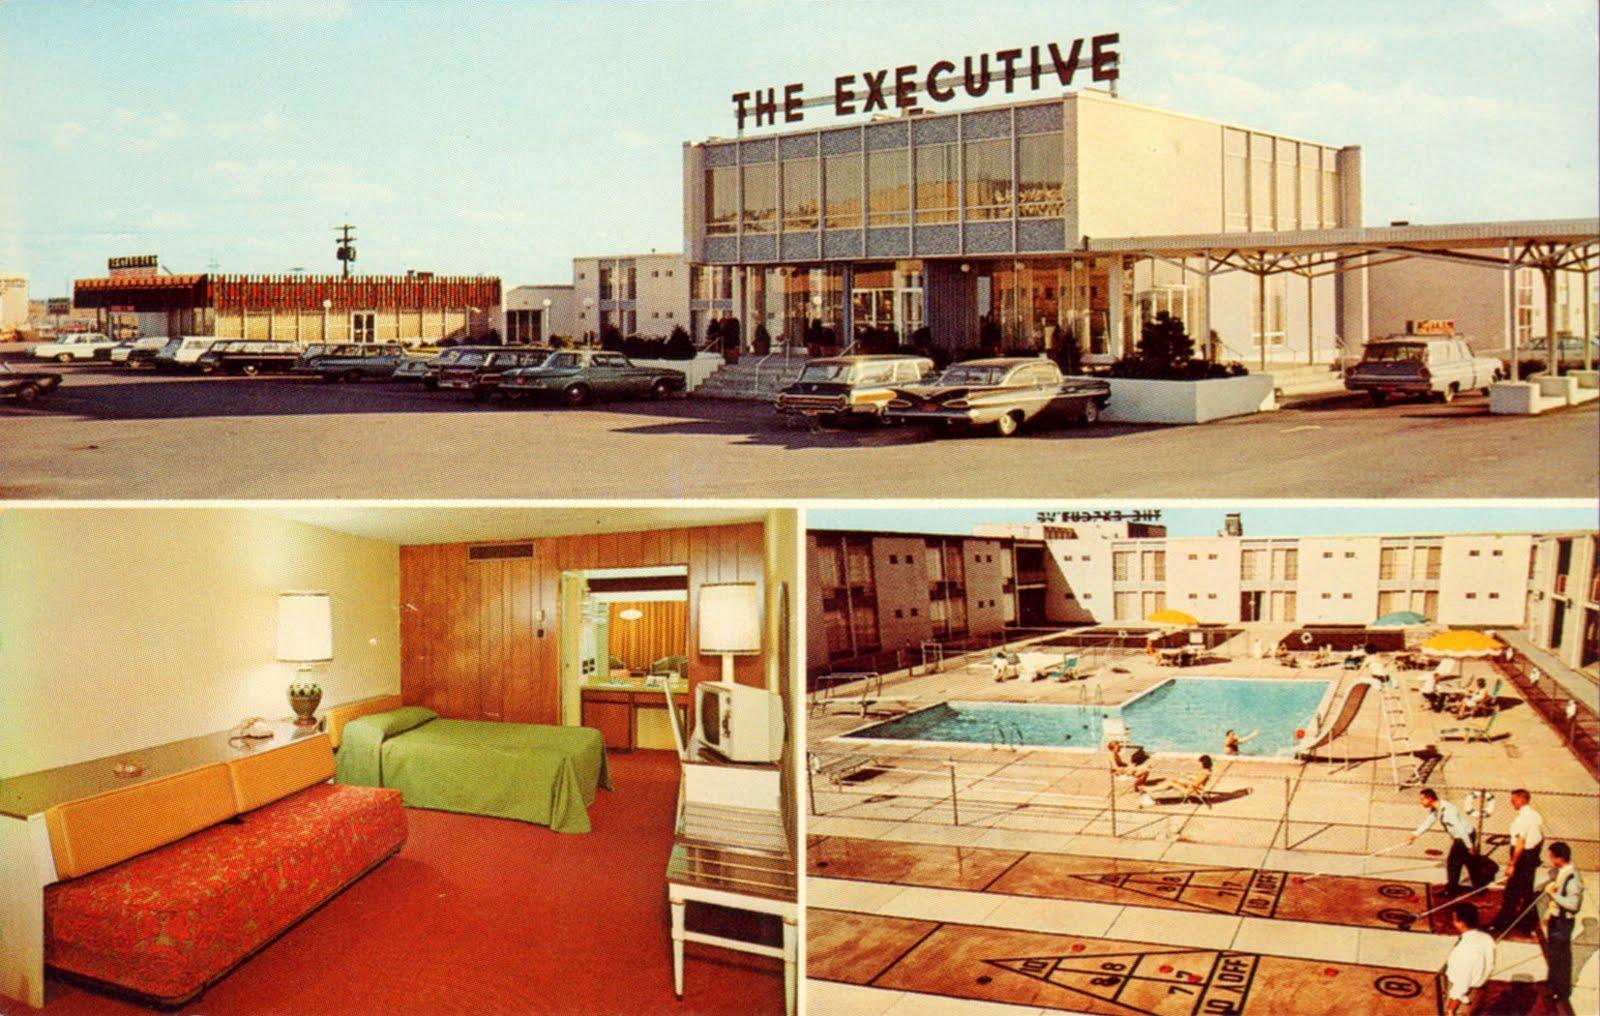 motel-executive-1970s.jpg